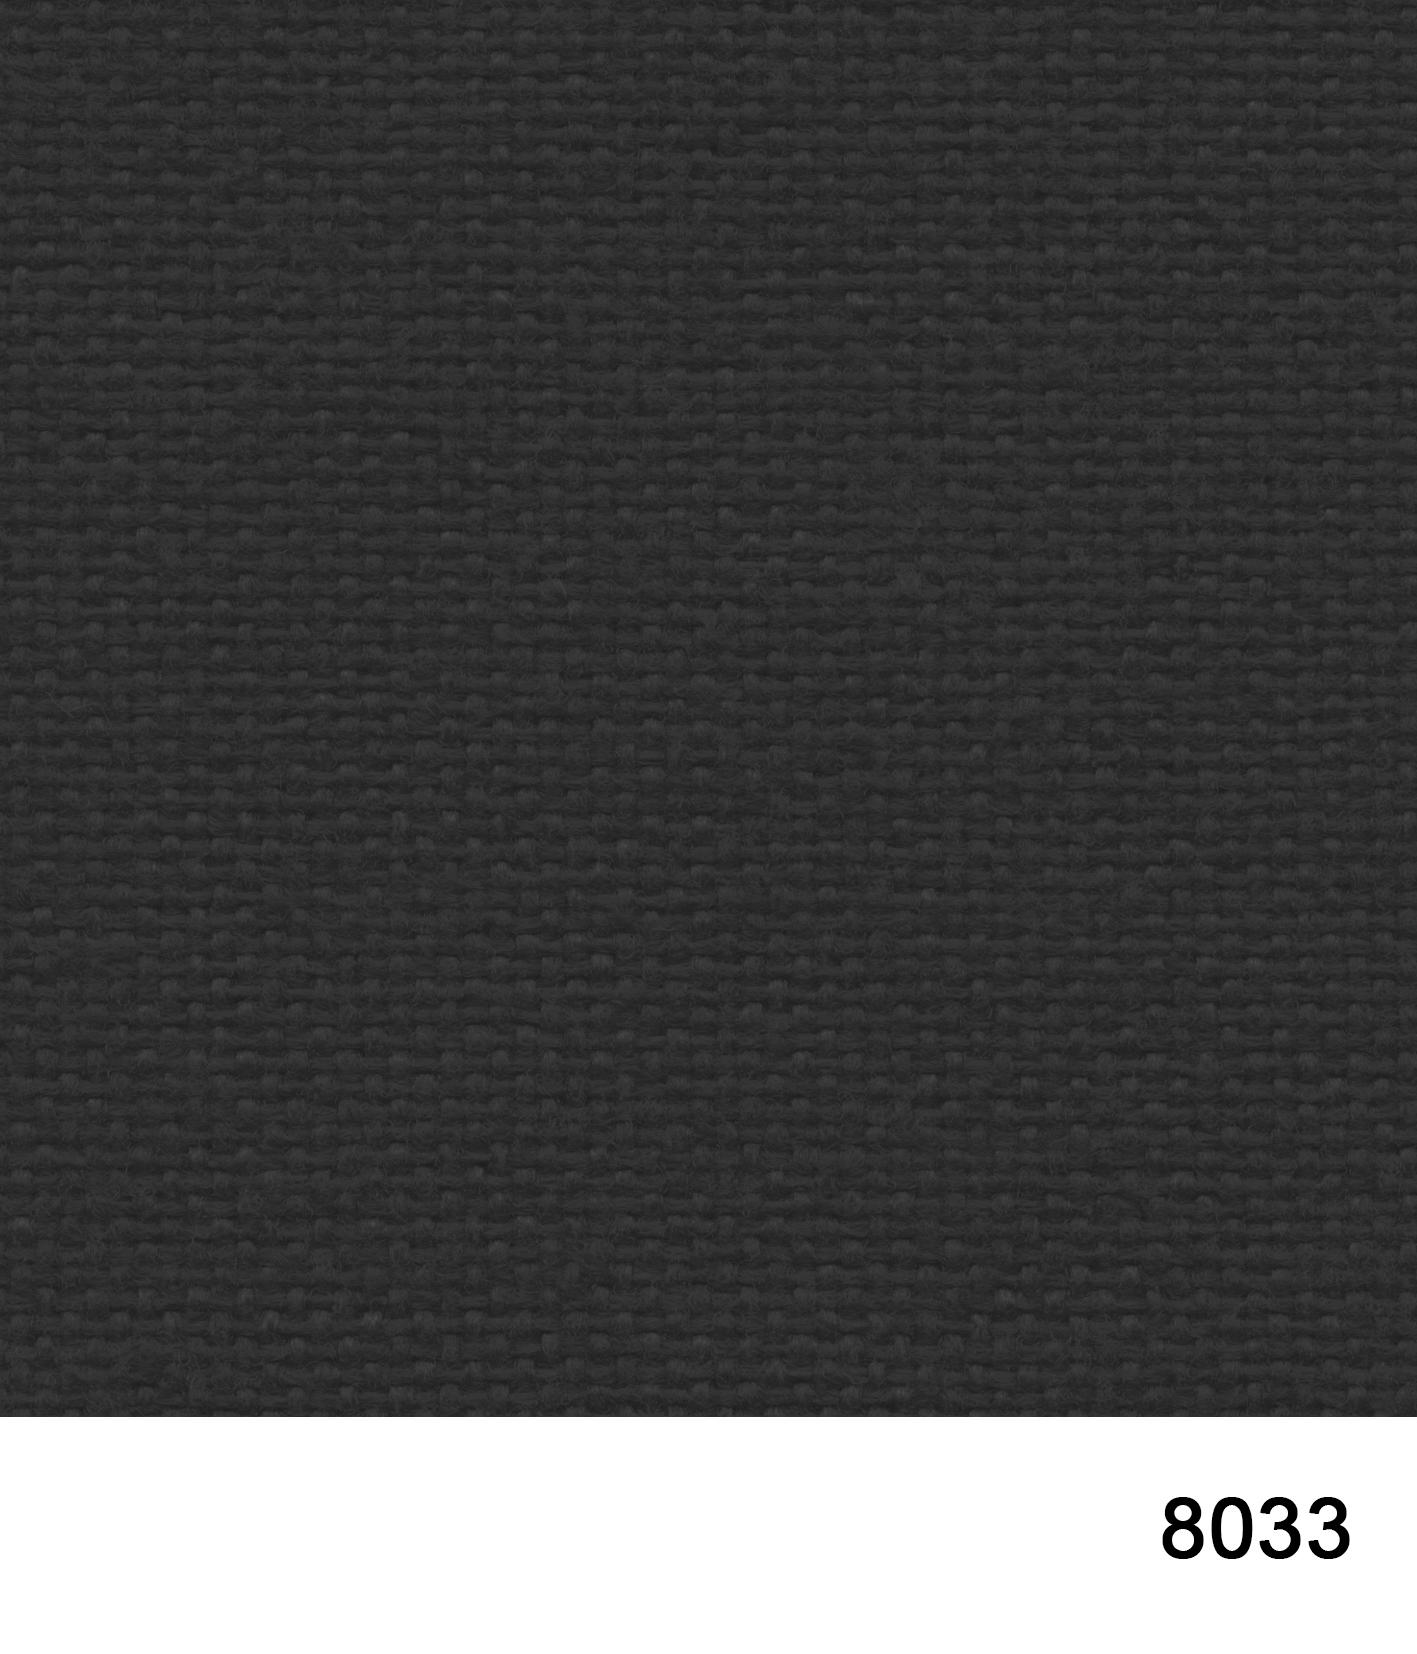 JET BIOACTIVE 3151